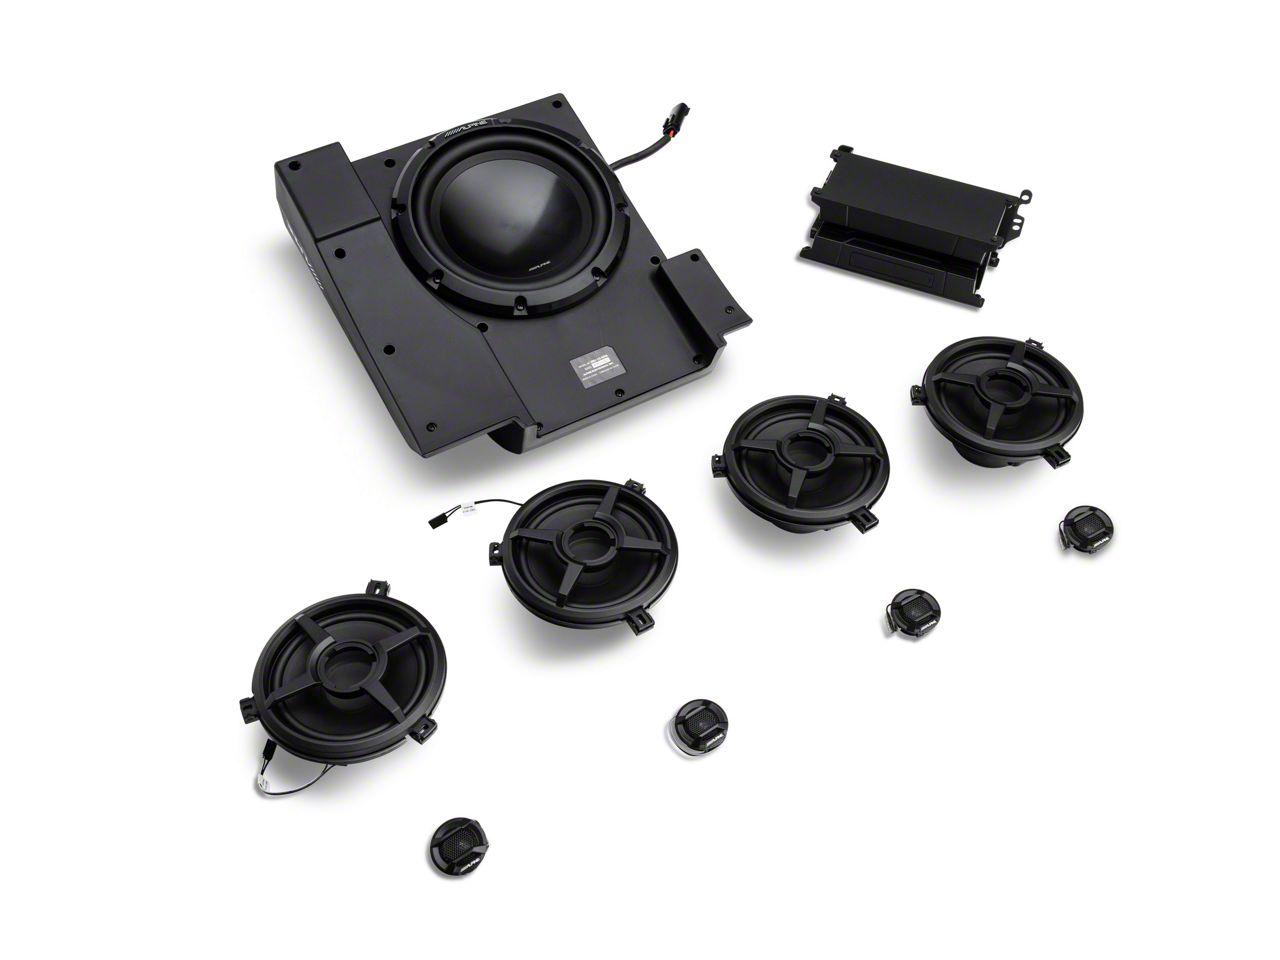 Alpine Full Sound System Upgrade - 600W (11-18 Jeep Wrangler JK 4 Door)